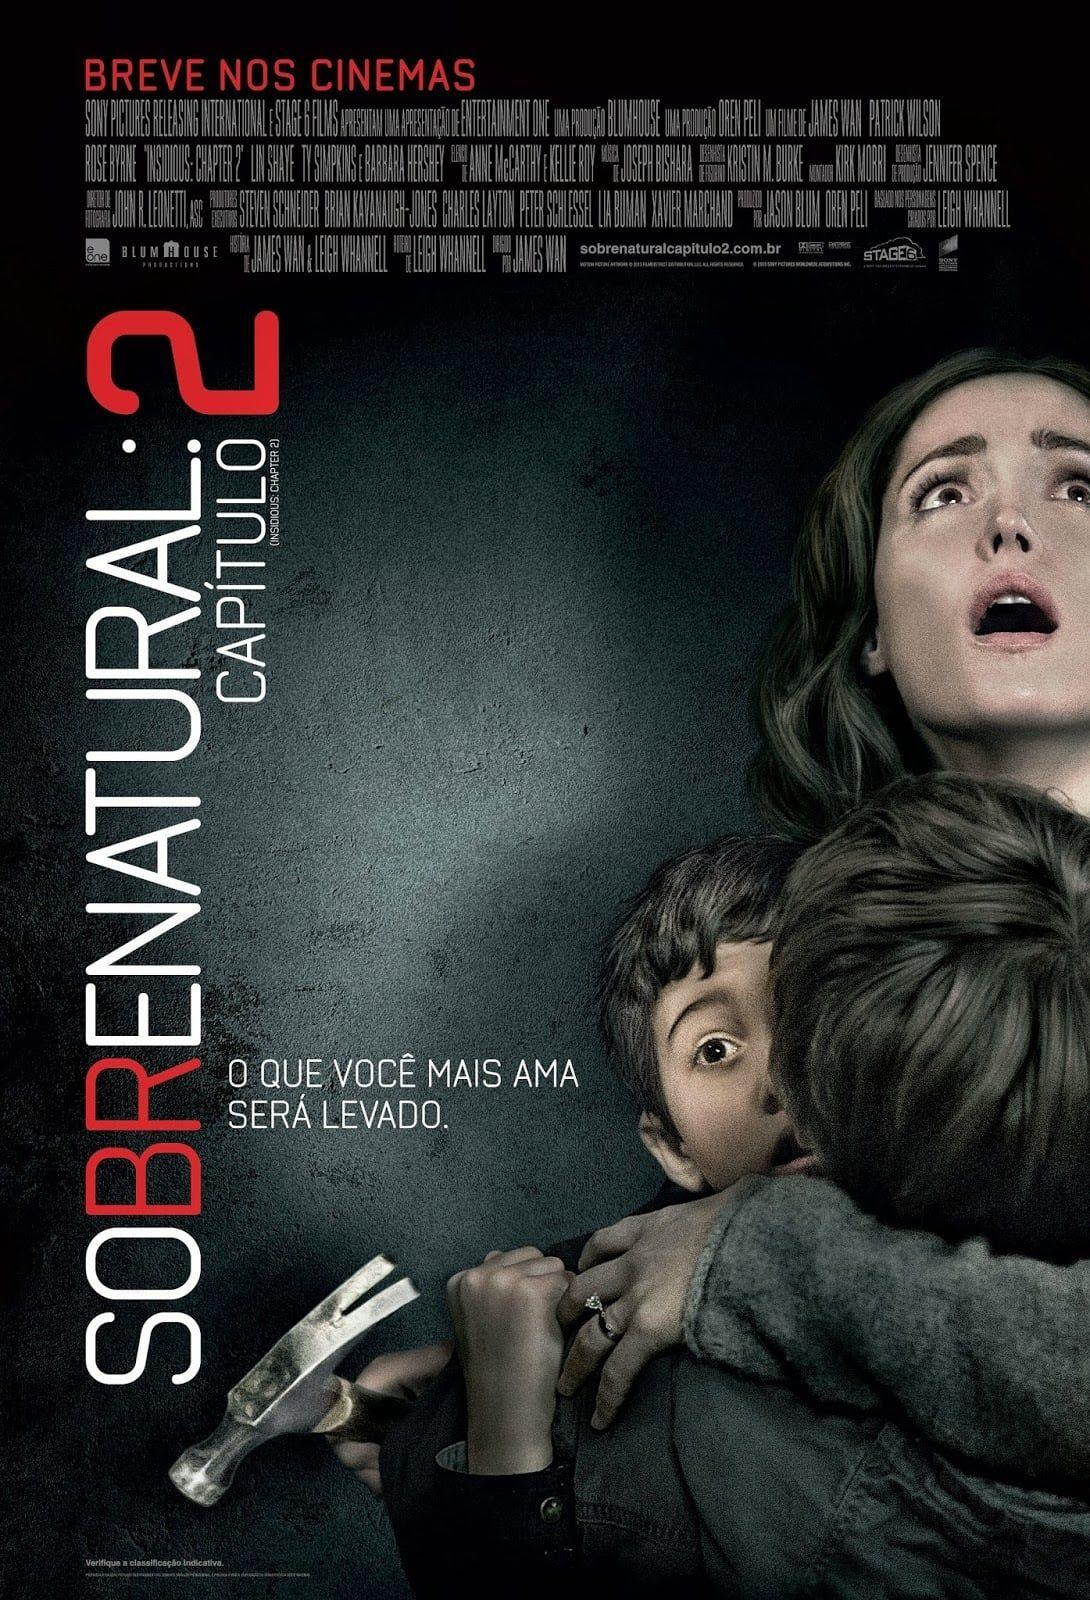 Assistir Sobrenatural Capitulo 2 Insidious Chapter 2 Dublado Online Hd A Familia Lambert Formada Por Josh Melhores Filmes De Terror Filmes Filmes On Line